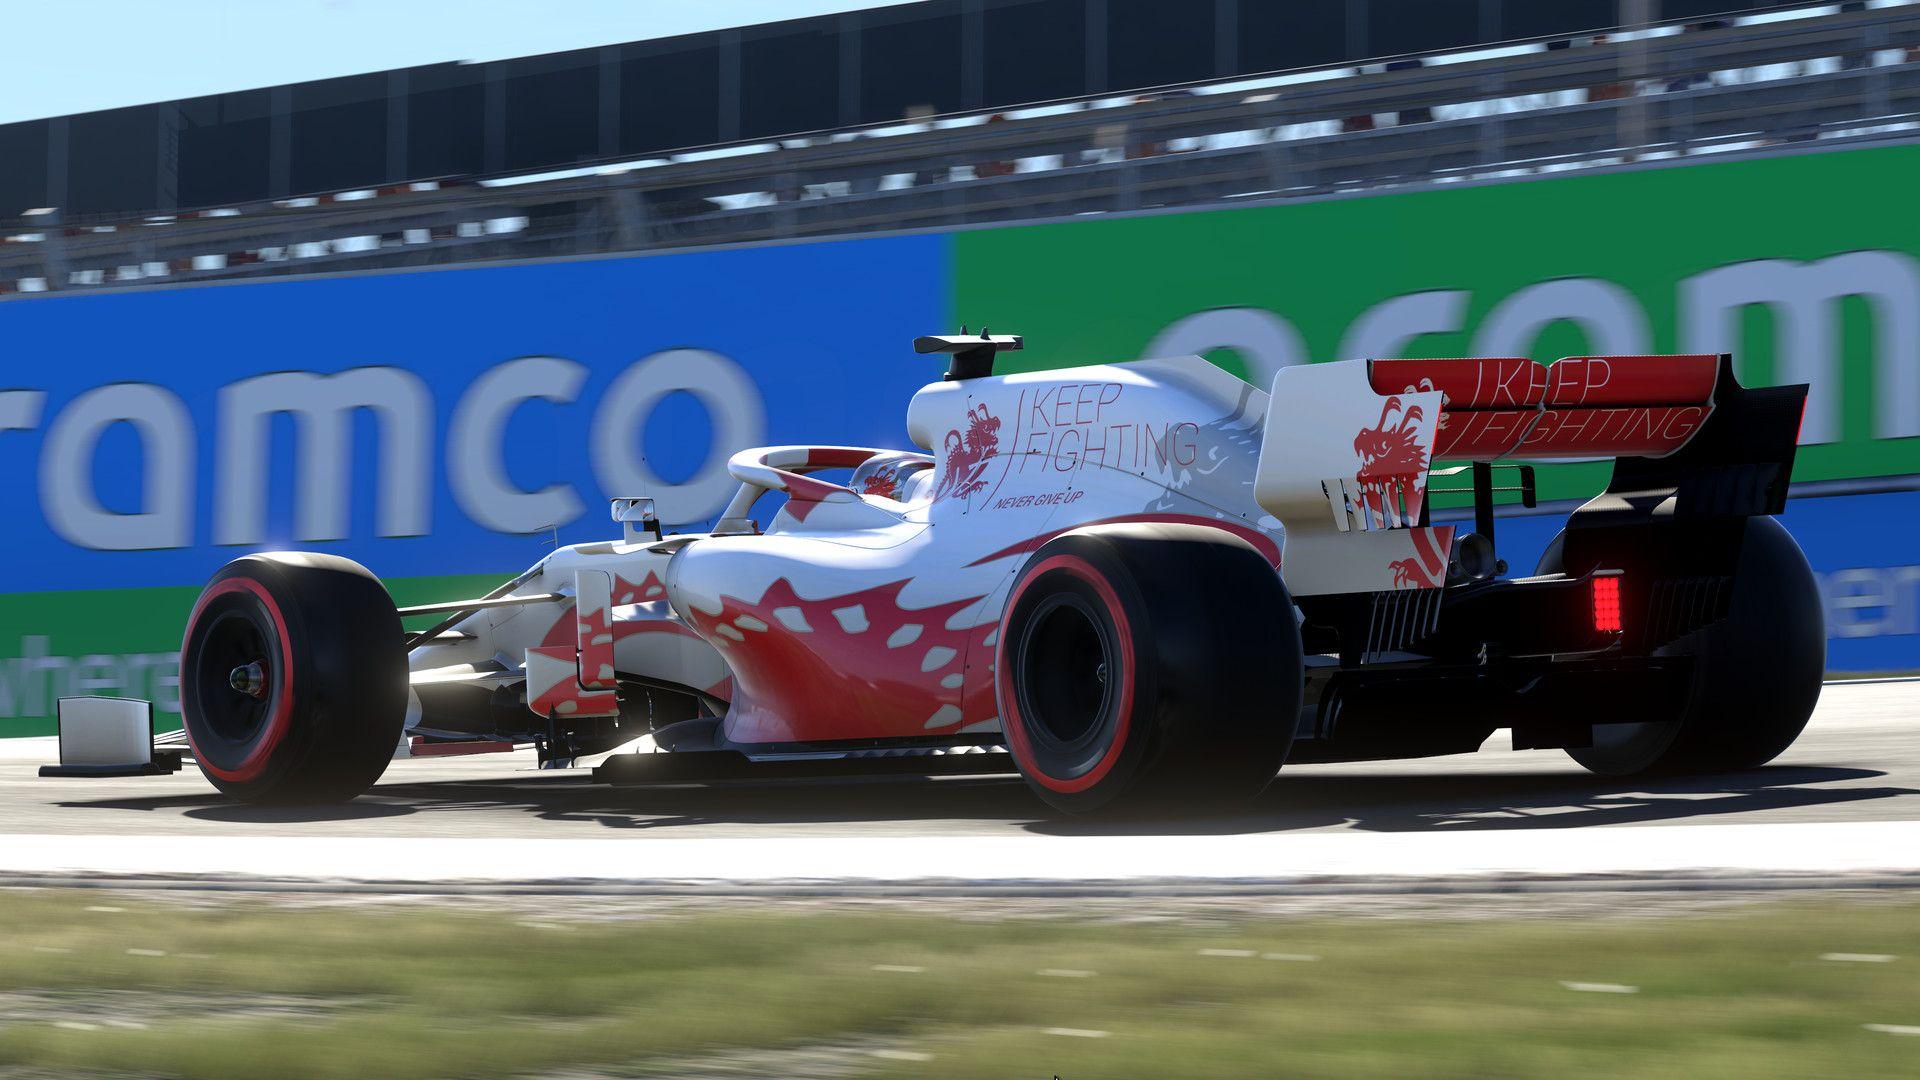 F12020KEEPFIGHTING1.jpg